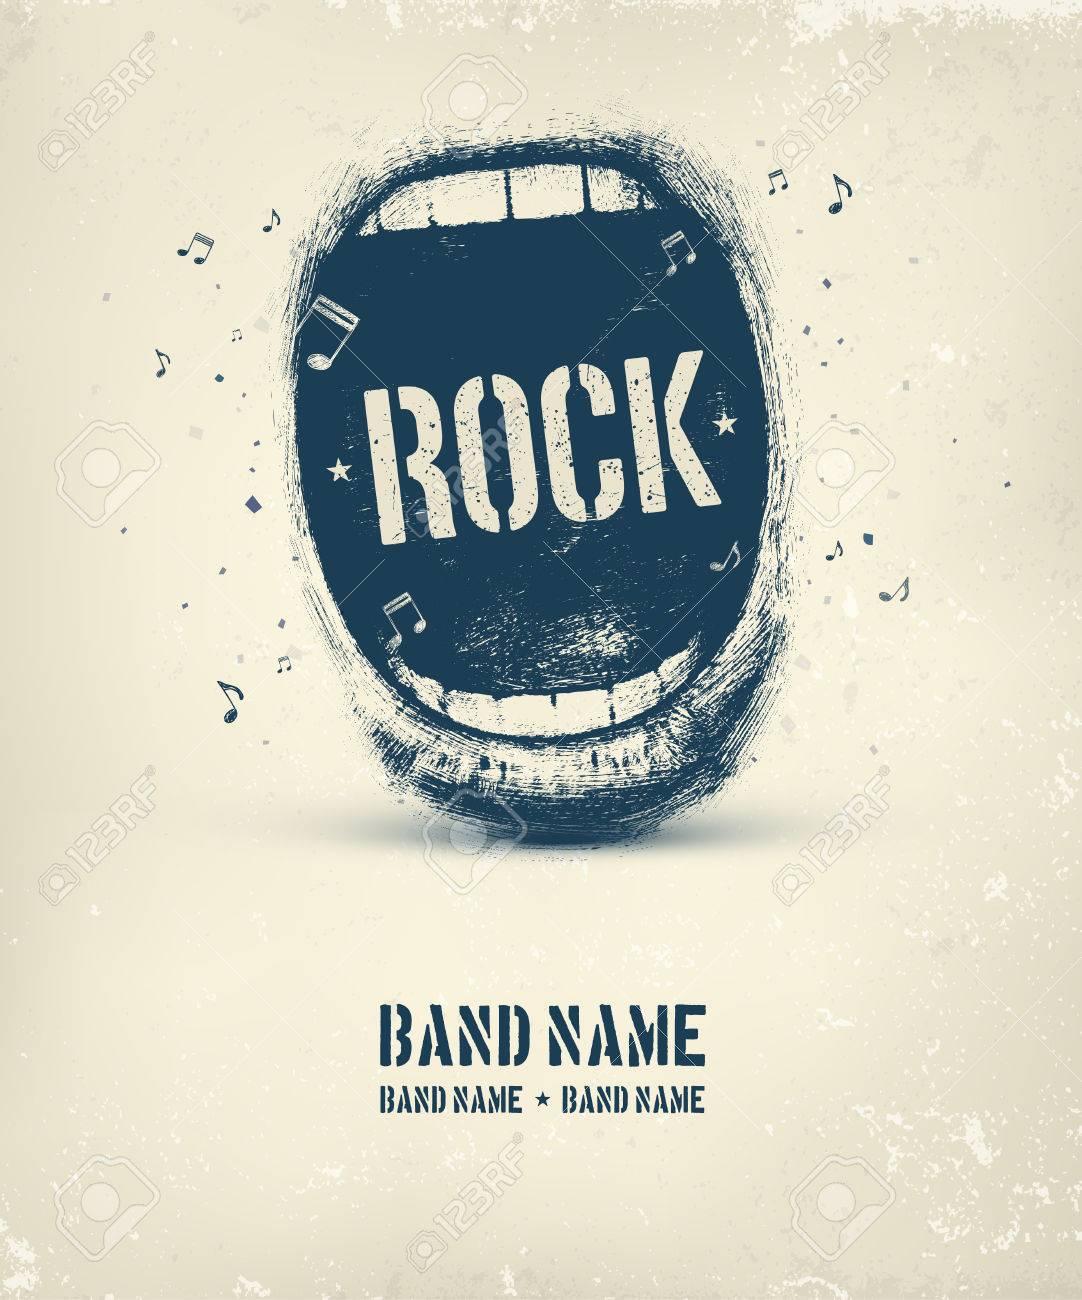 Rock music poster, eps 10 Standard-Bild - 38674656